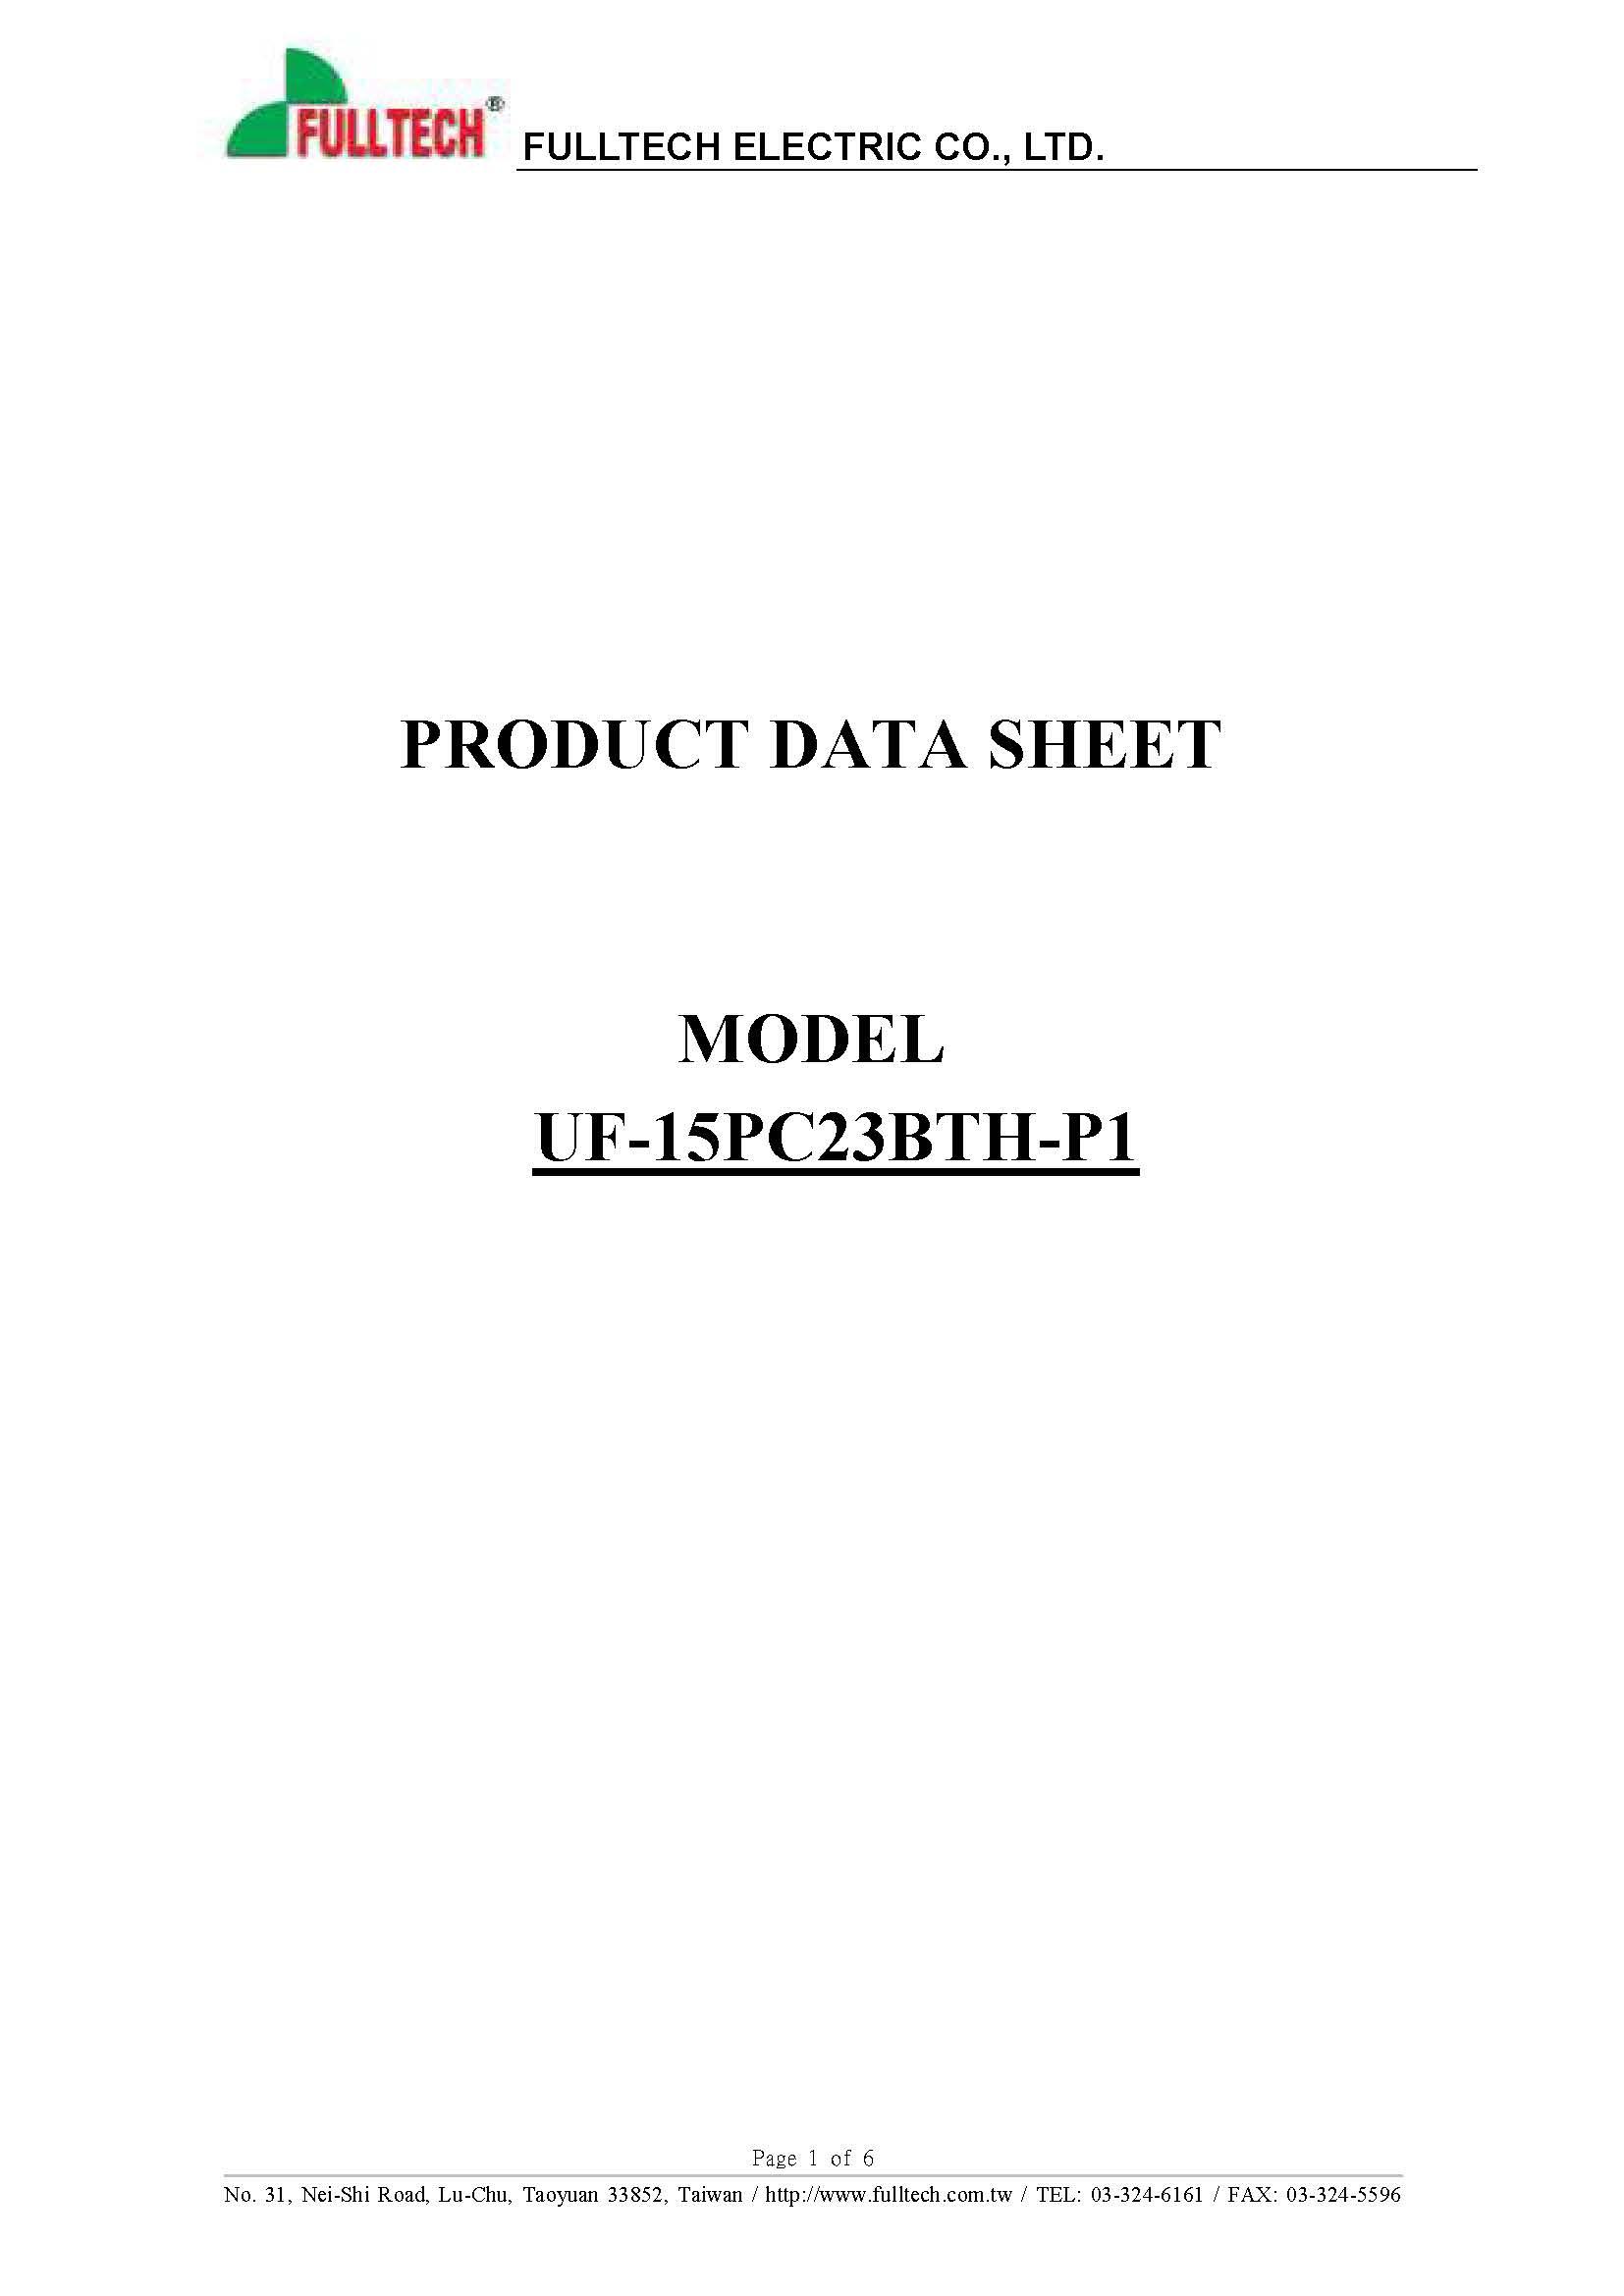 15PC23BTH-P1 Data sheet_페이지_1.jpg